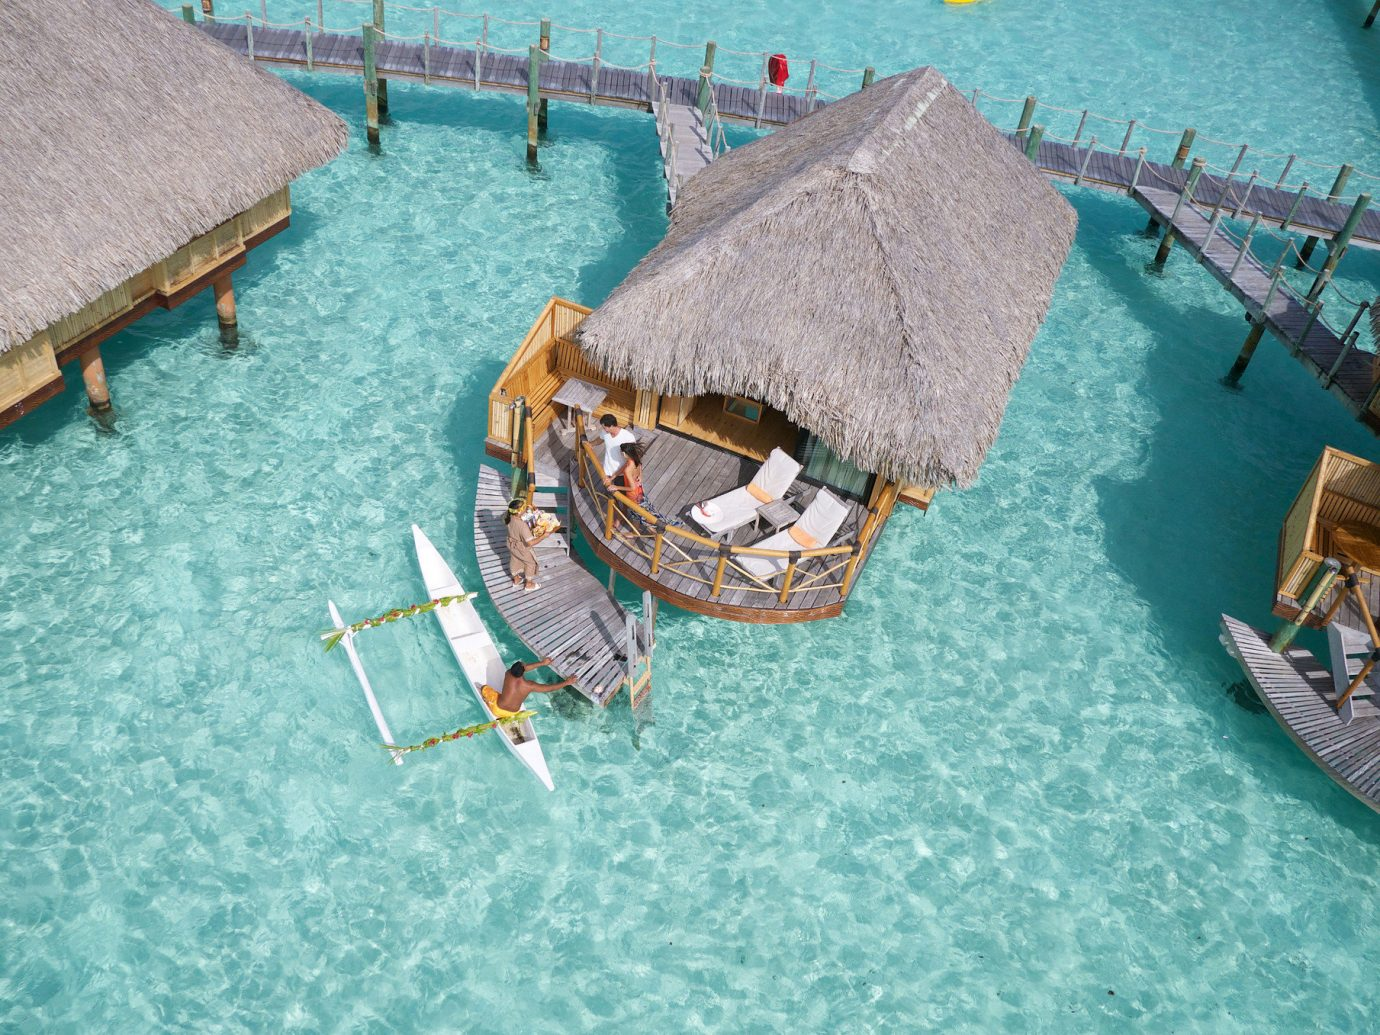 Hotels blue water vehicle Boat Sea swimming pool